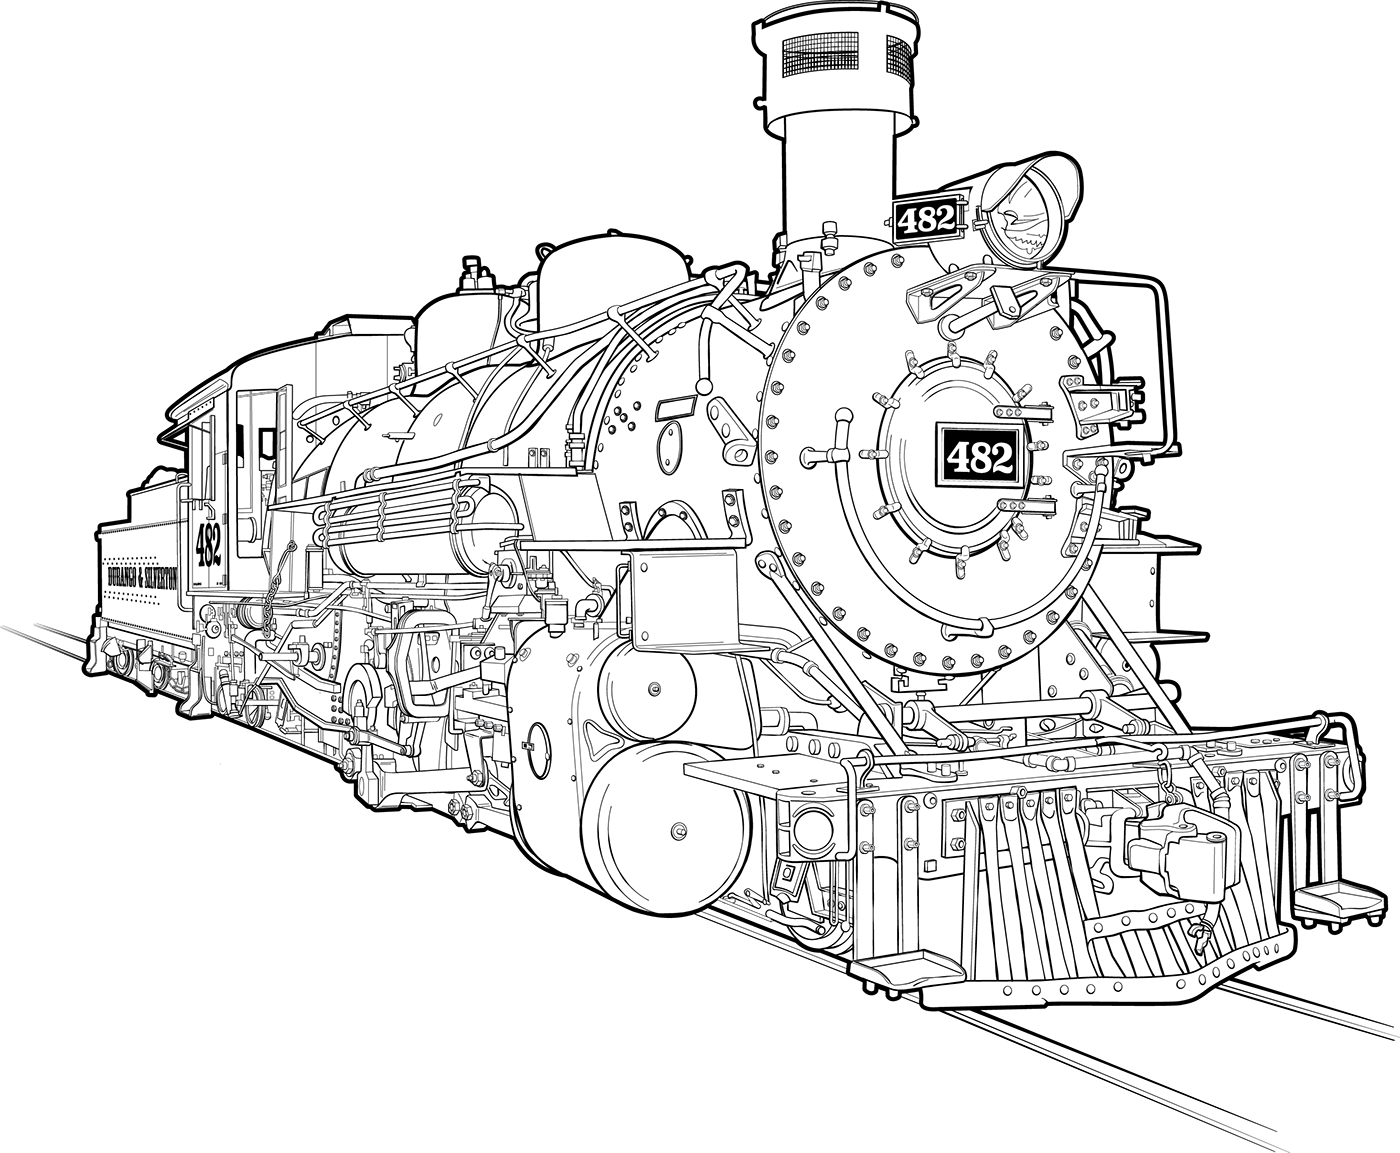 d u0026sng 482 steam engine line art tech illustration on behance